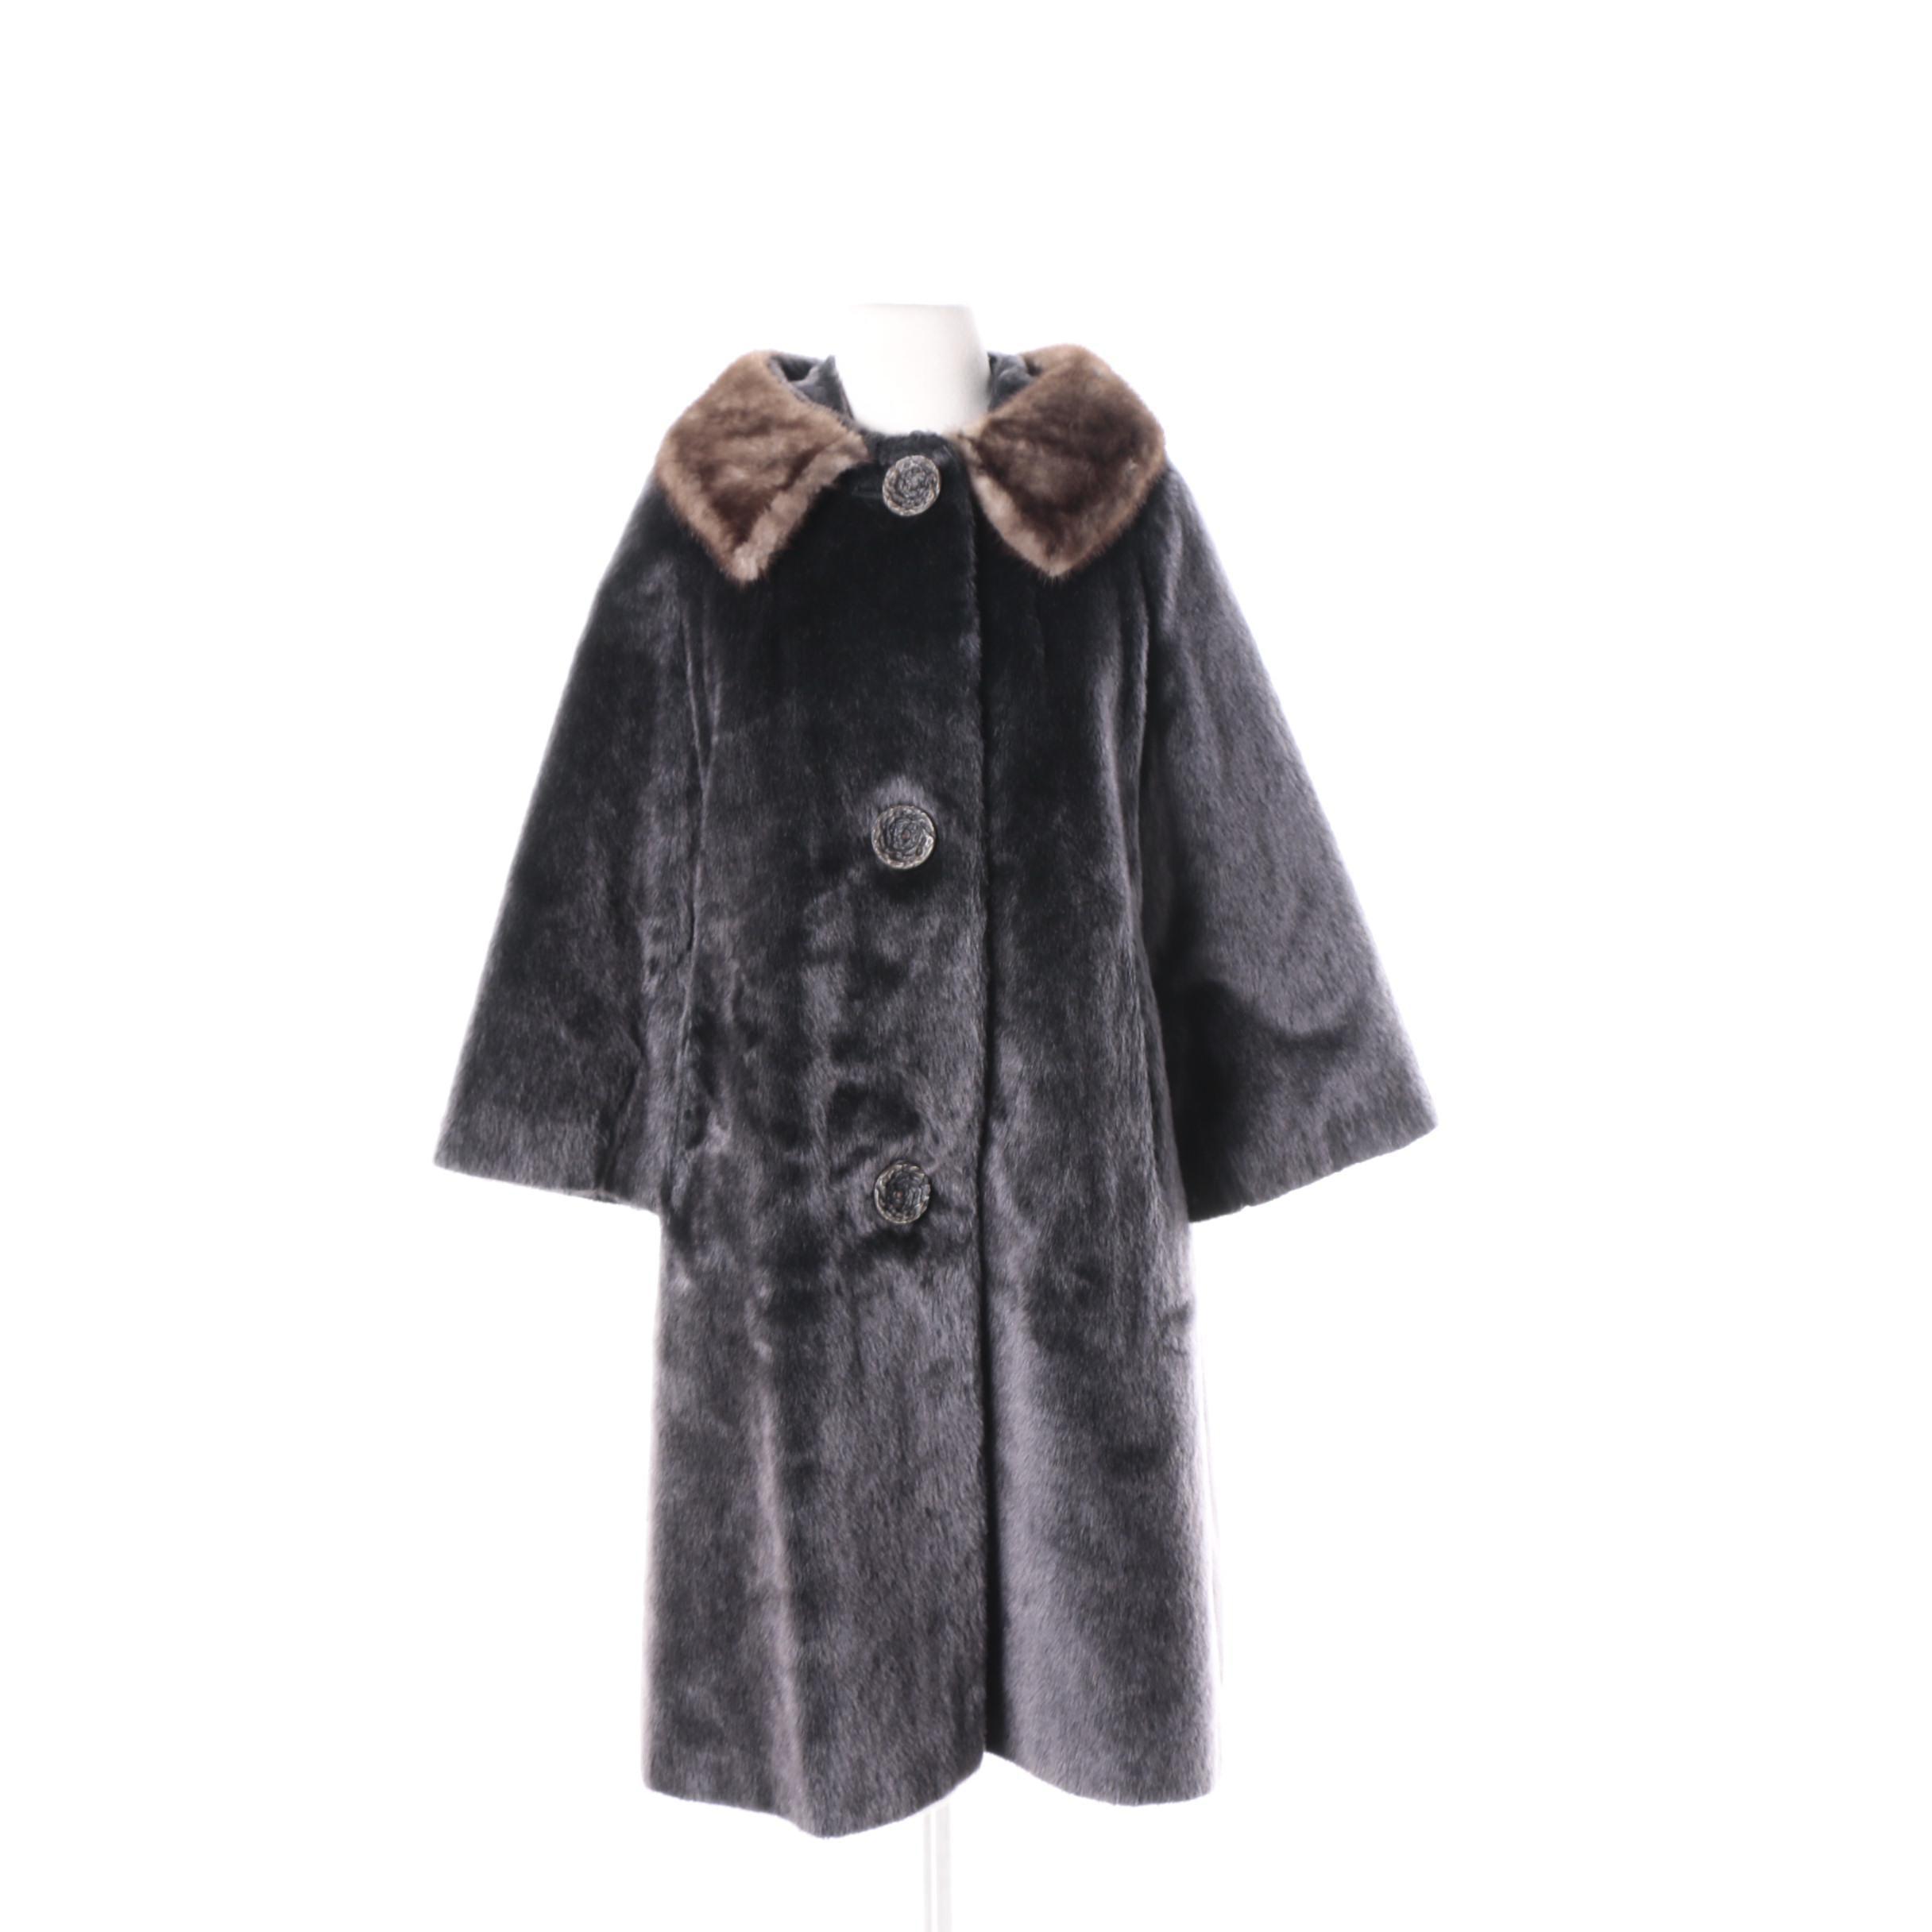 Vintage Strawbridge & Clothier Faux Fur Coat with Mink Fur Collar